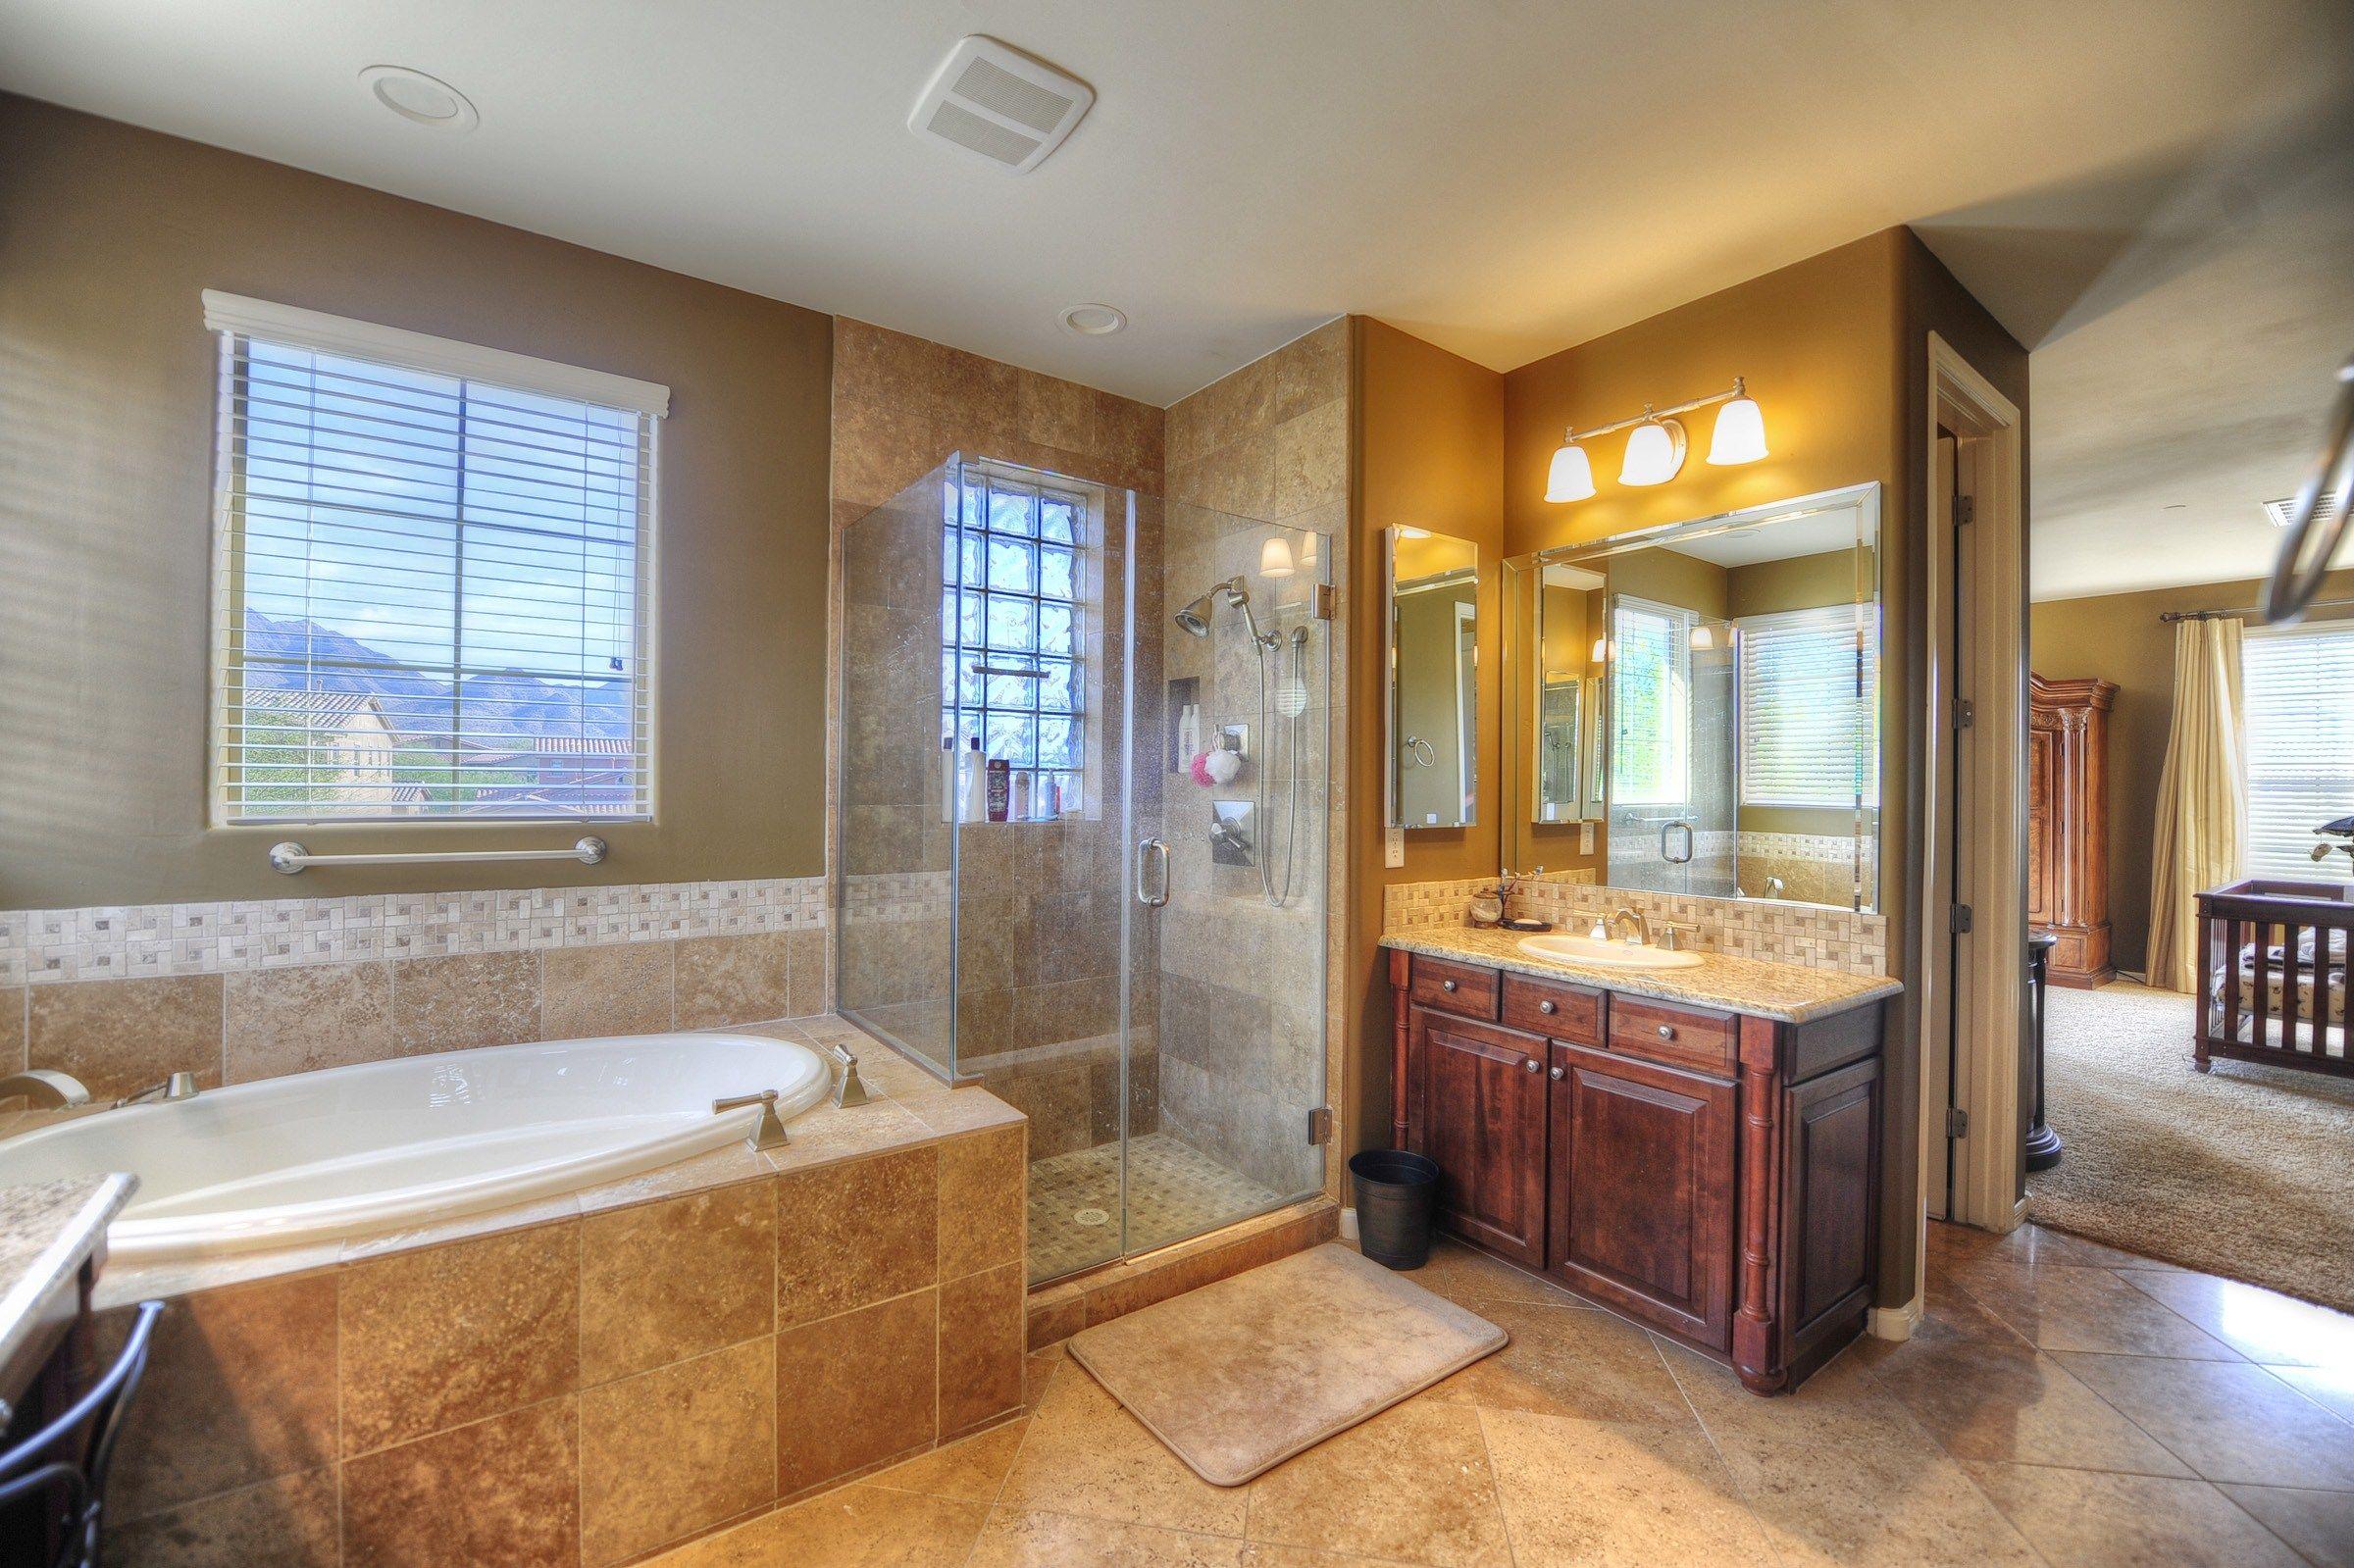 Bathroom Ideas Travertine lavish master bathroom with soaking tub, shower and travertine